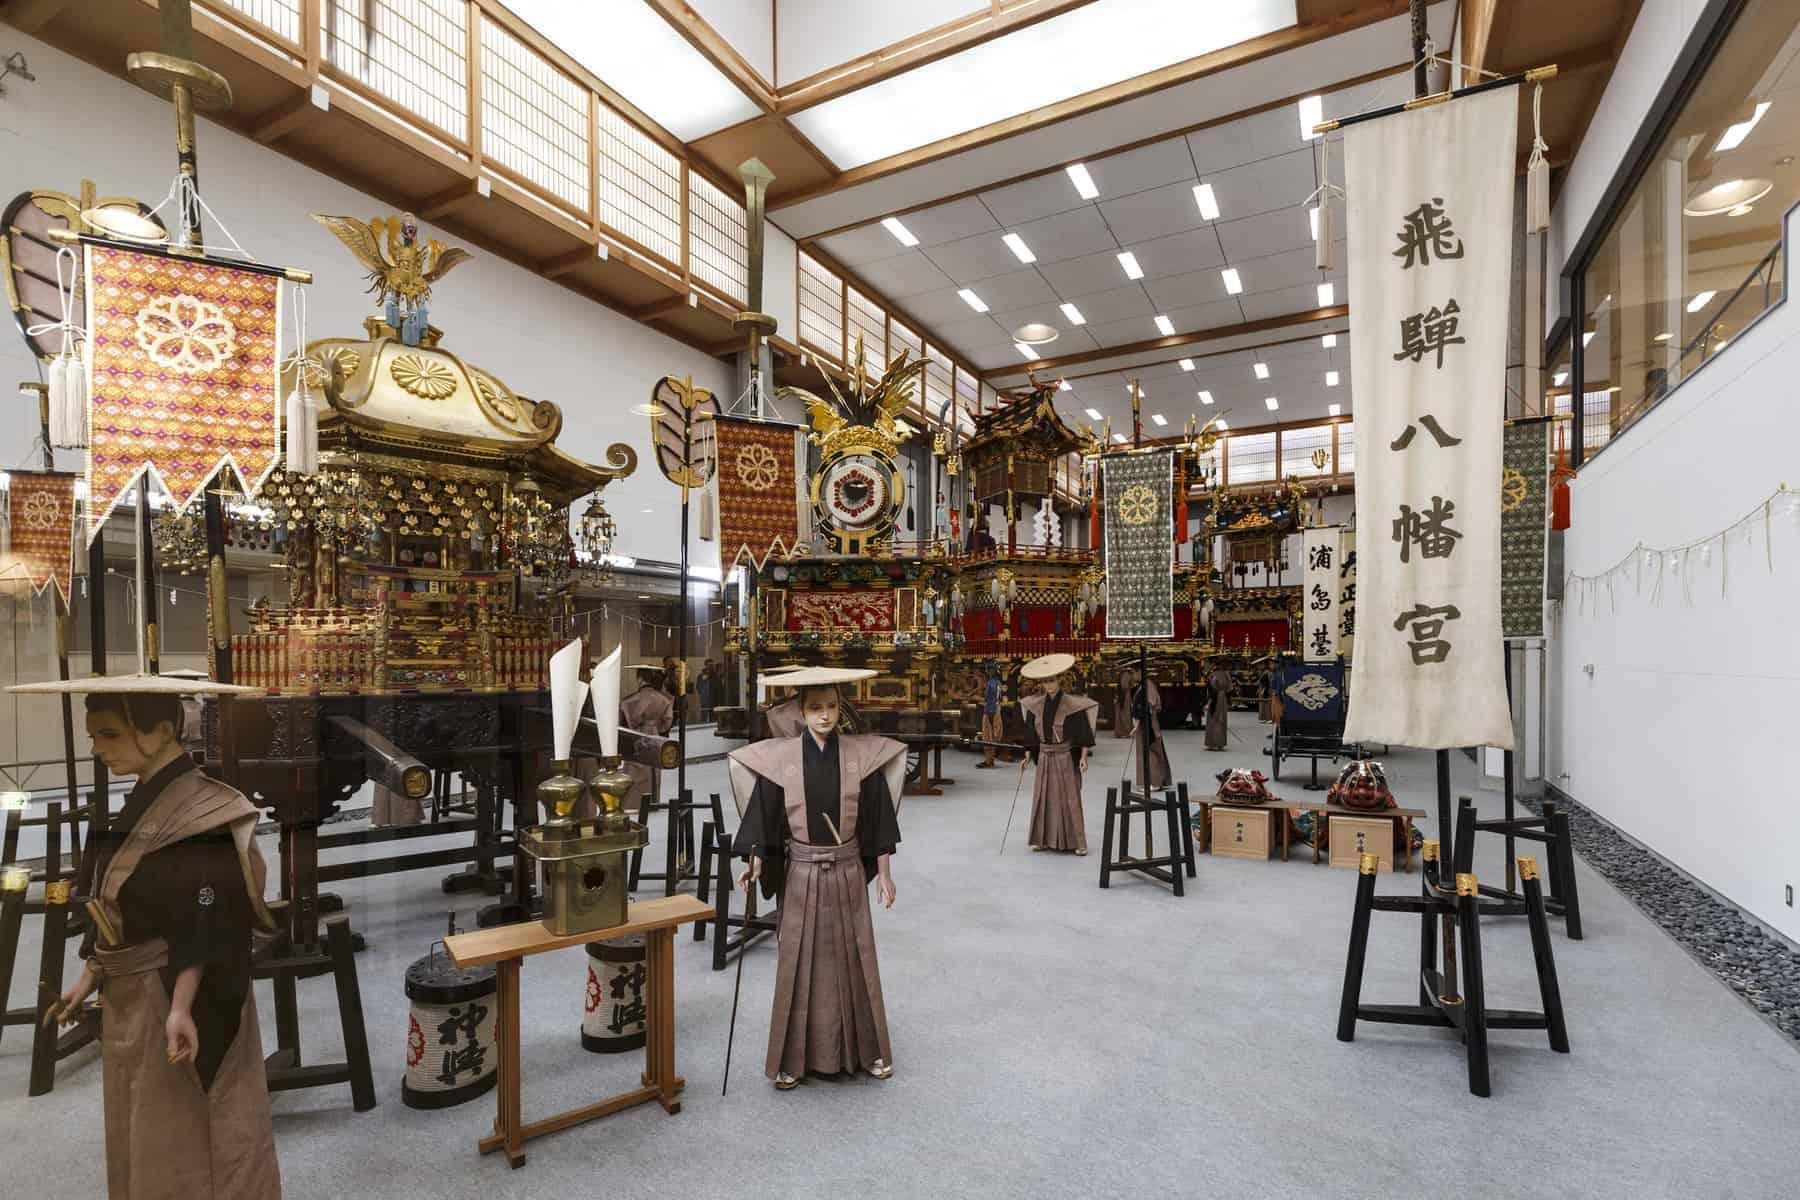 Four of the autumn festival`s eleven floats yatai are exhibited at the Takayama Matsuri Yatai Kaikan a hall next to Sakurayama Hachiman Shrine.